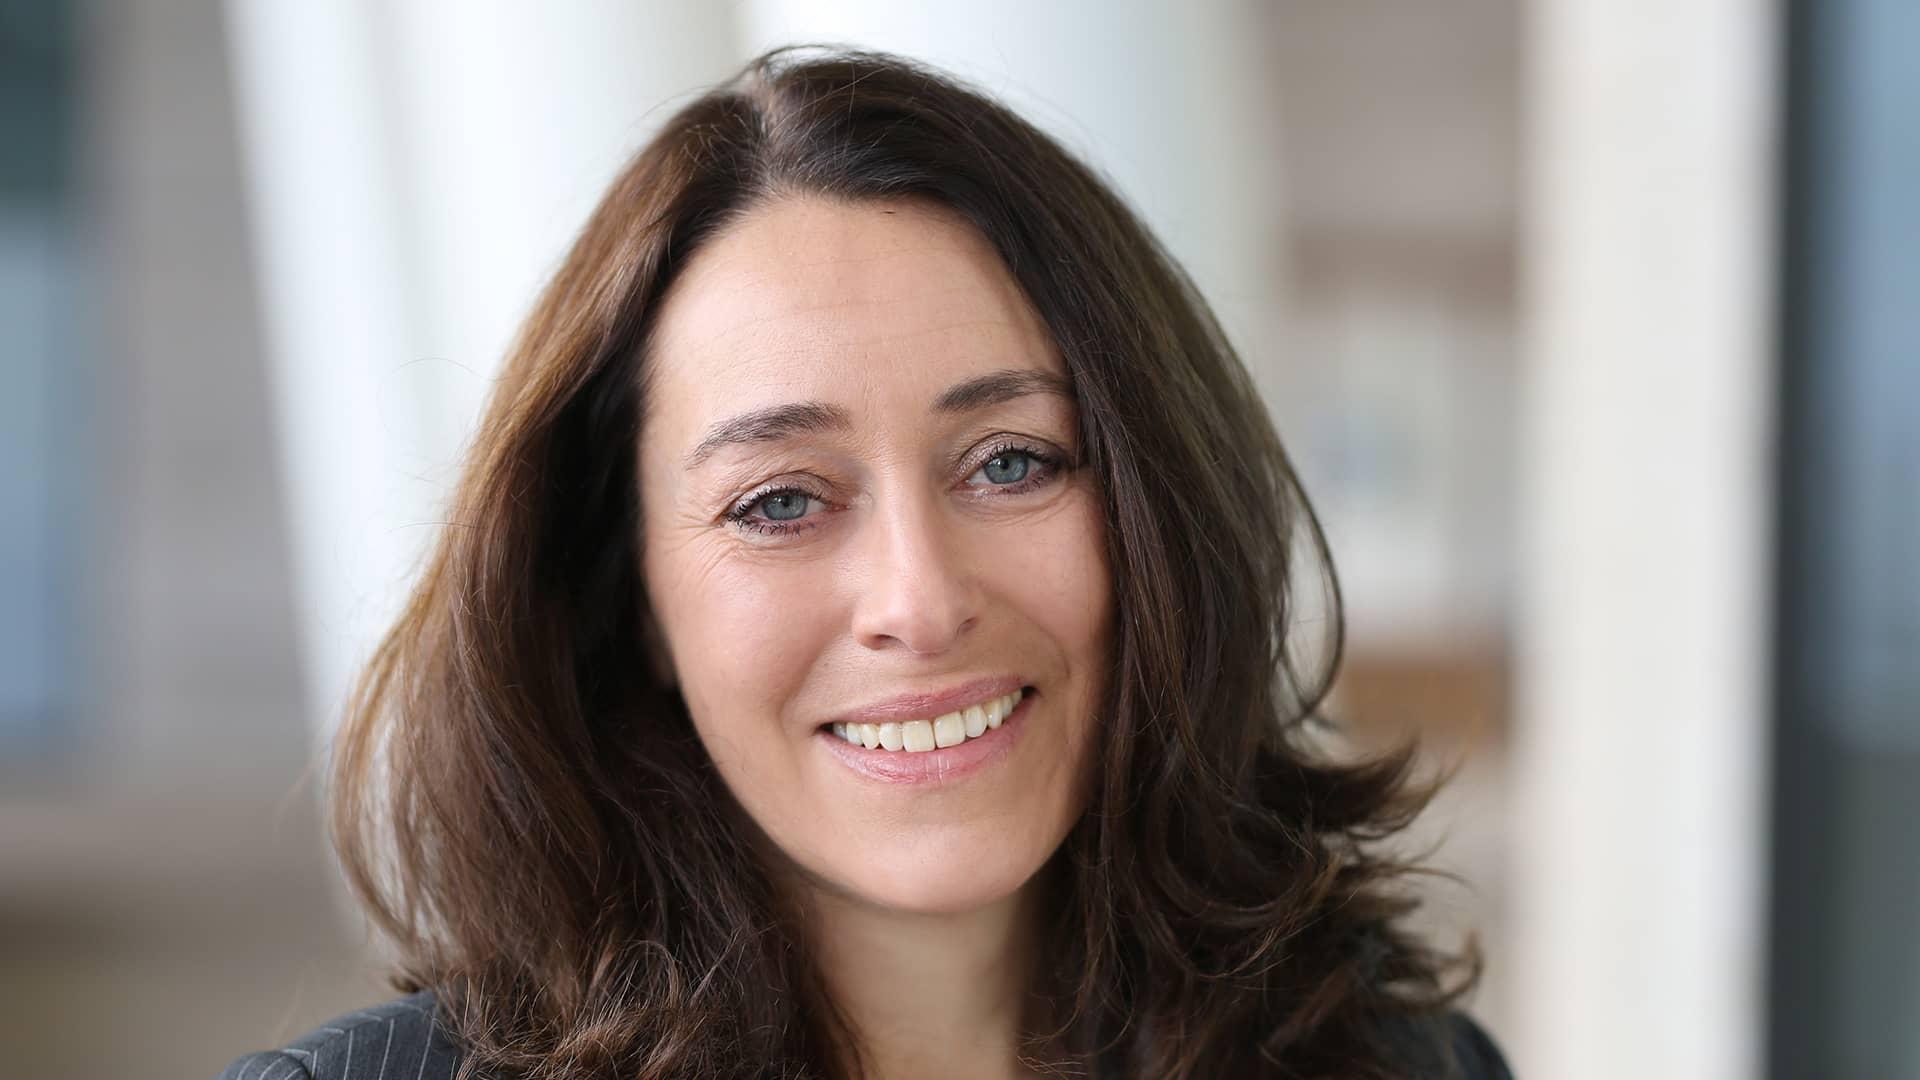 Anja Proske